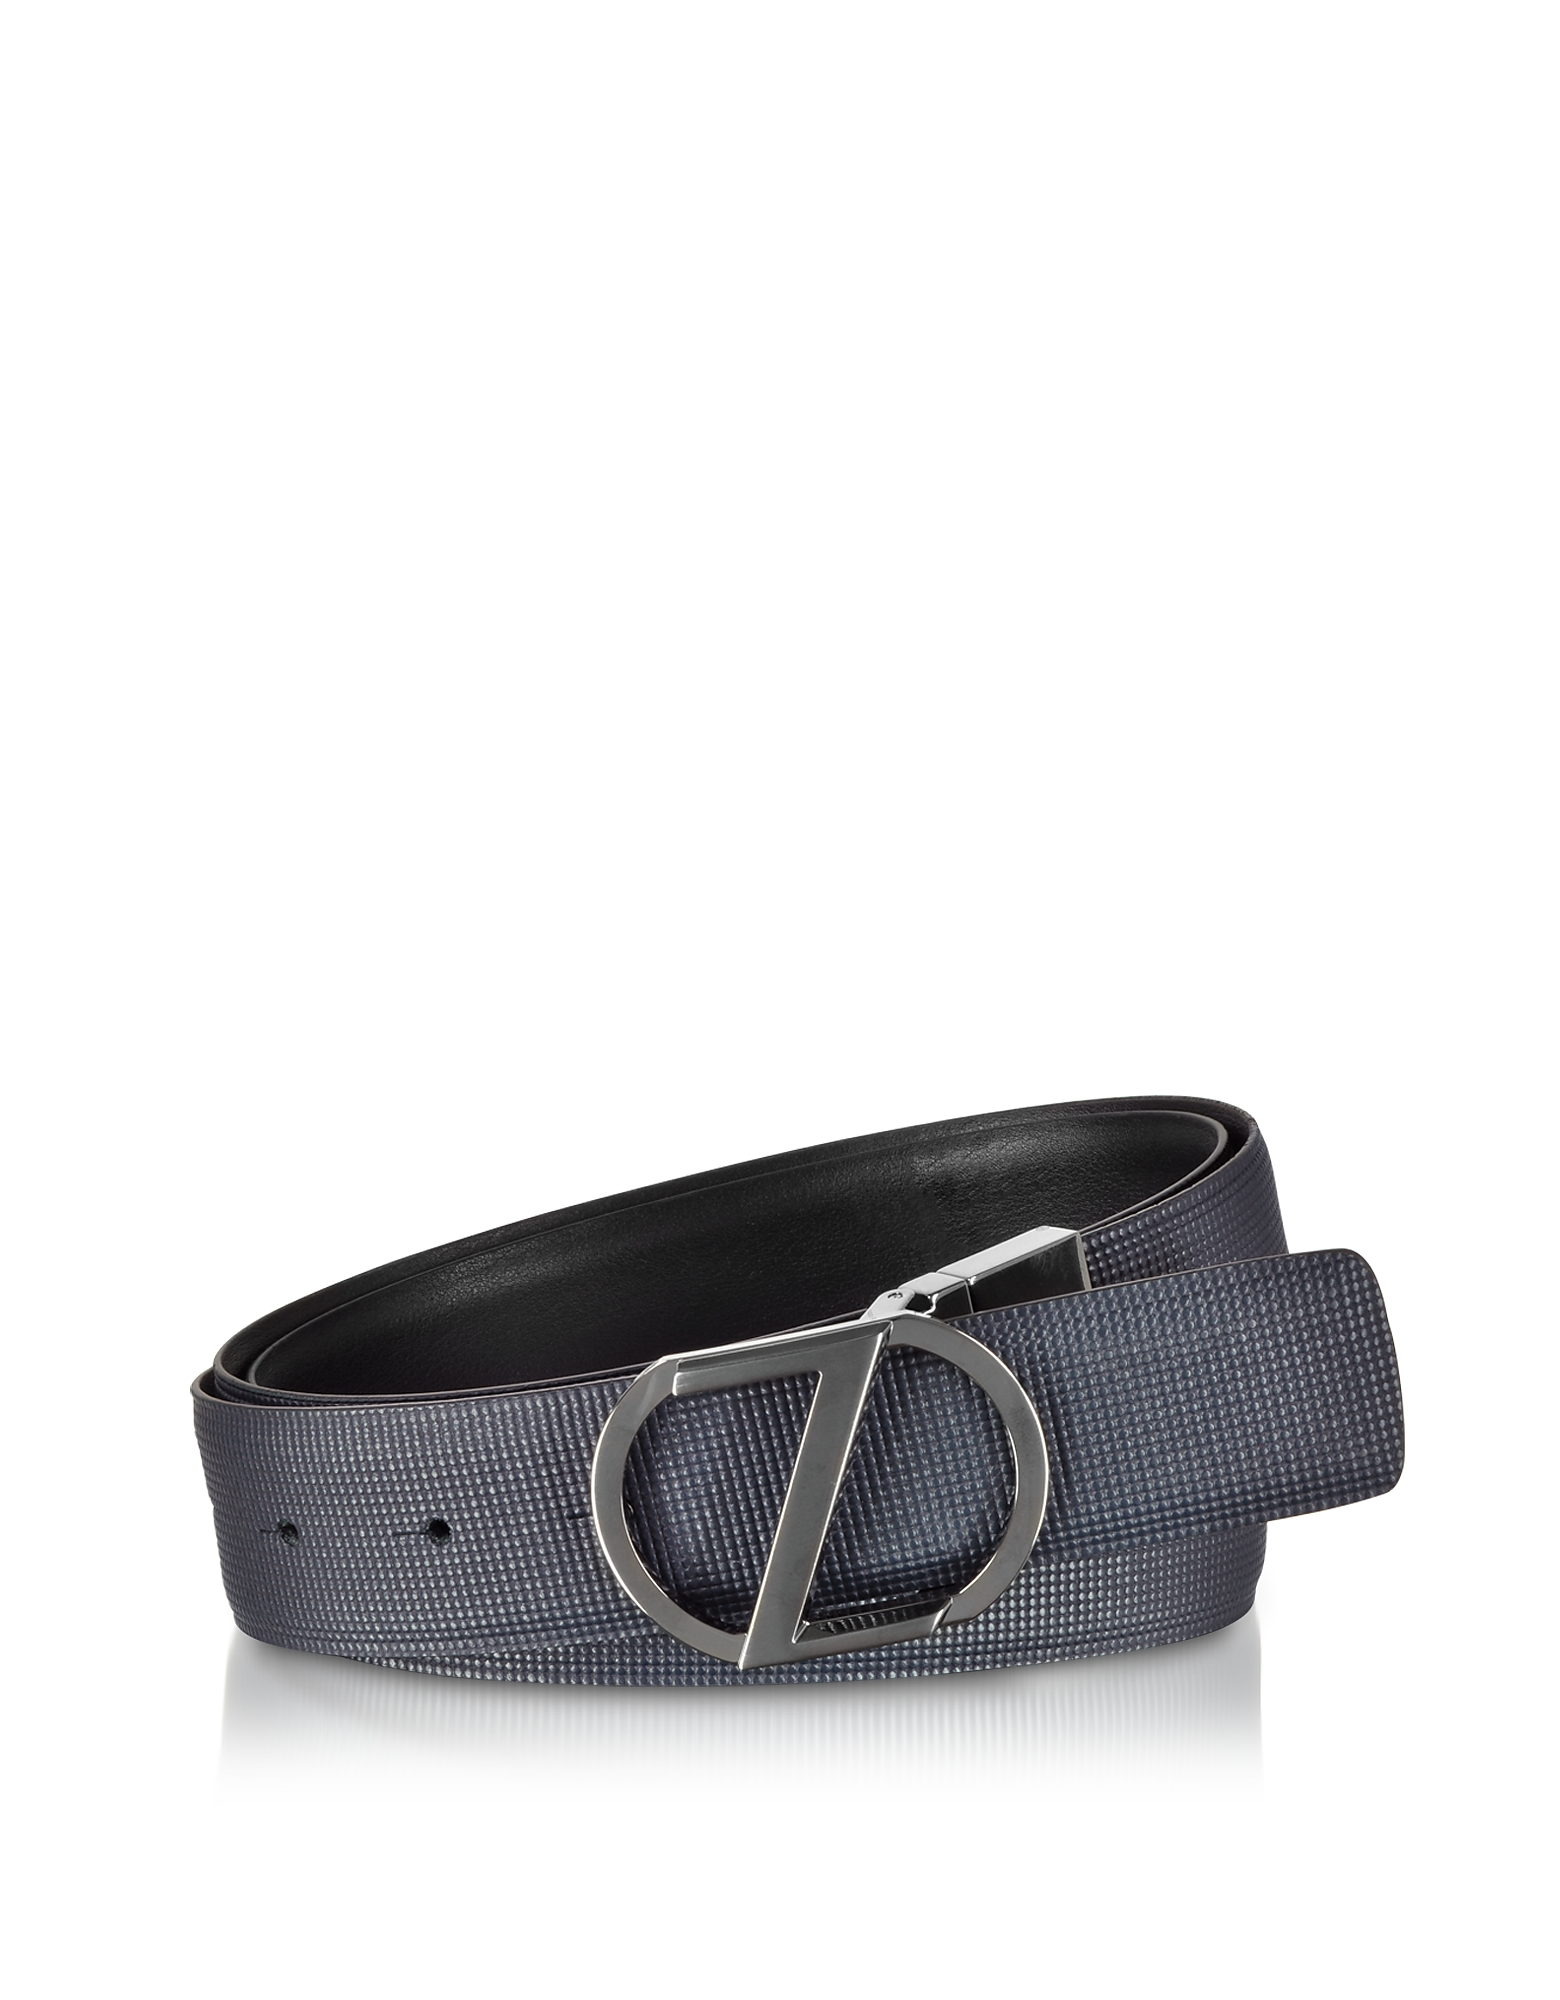 Navy Blue & Black Cross Grain Leather Adjustable and Reversible Men's Belt